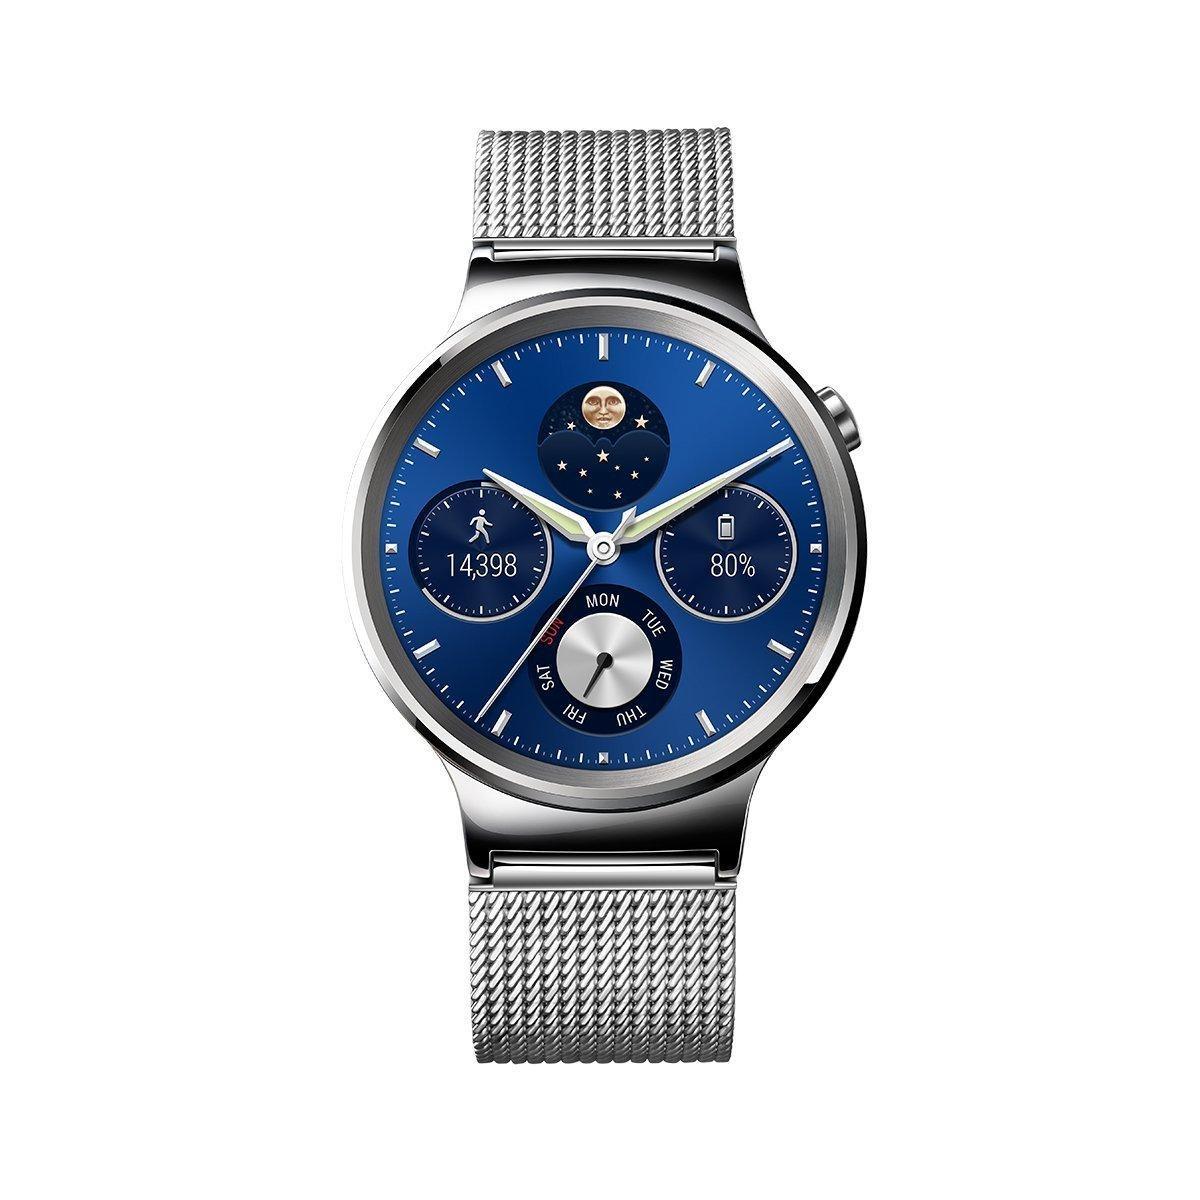 Montre connectée Huawei Watch Maille - Argent